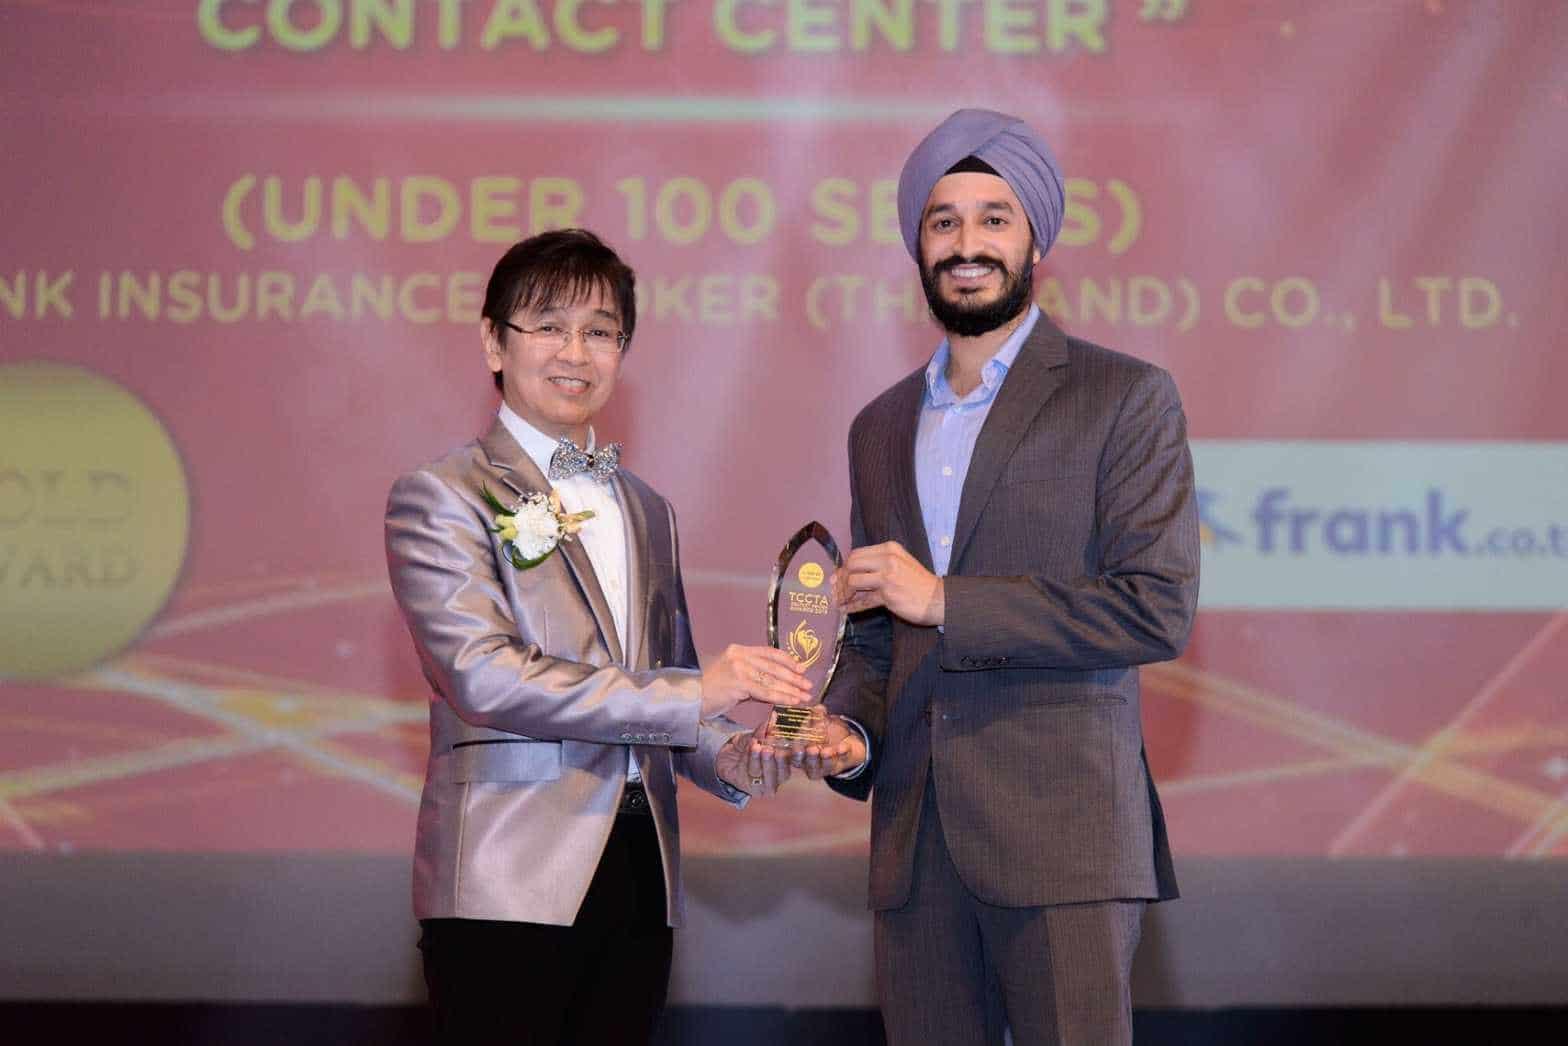 Frank.co.th ยืนหนึ่งด้านบริการ รับ 2 รางวัลจาก TCCTA